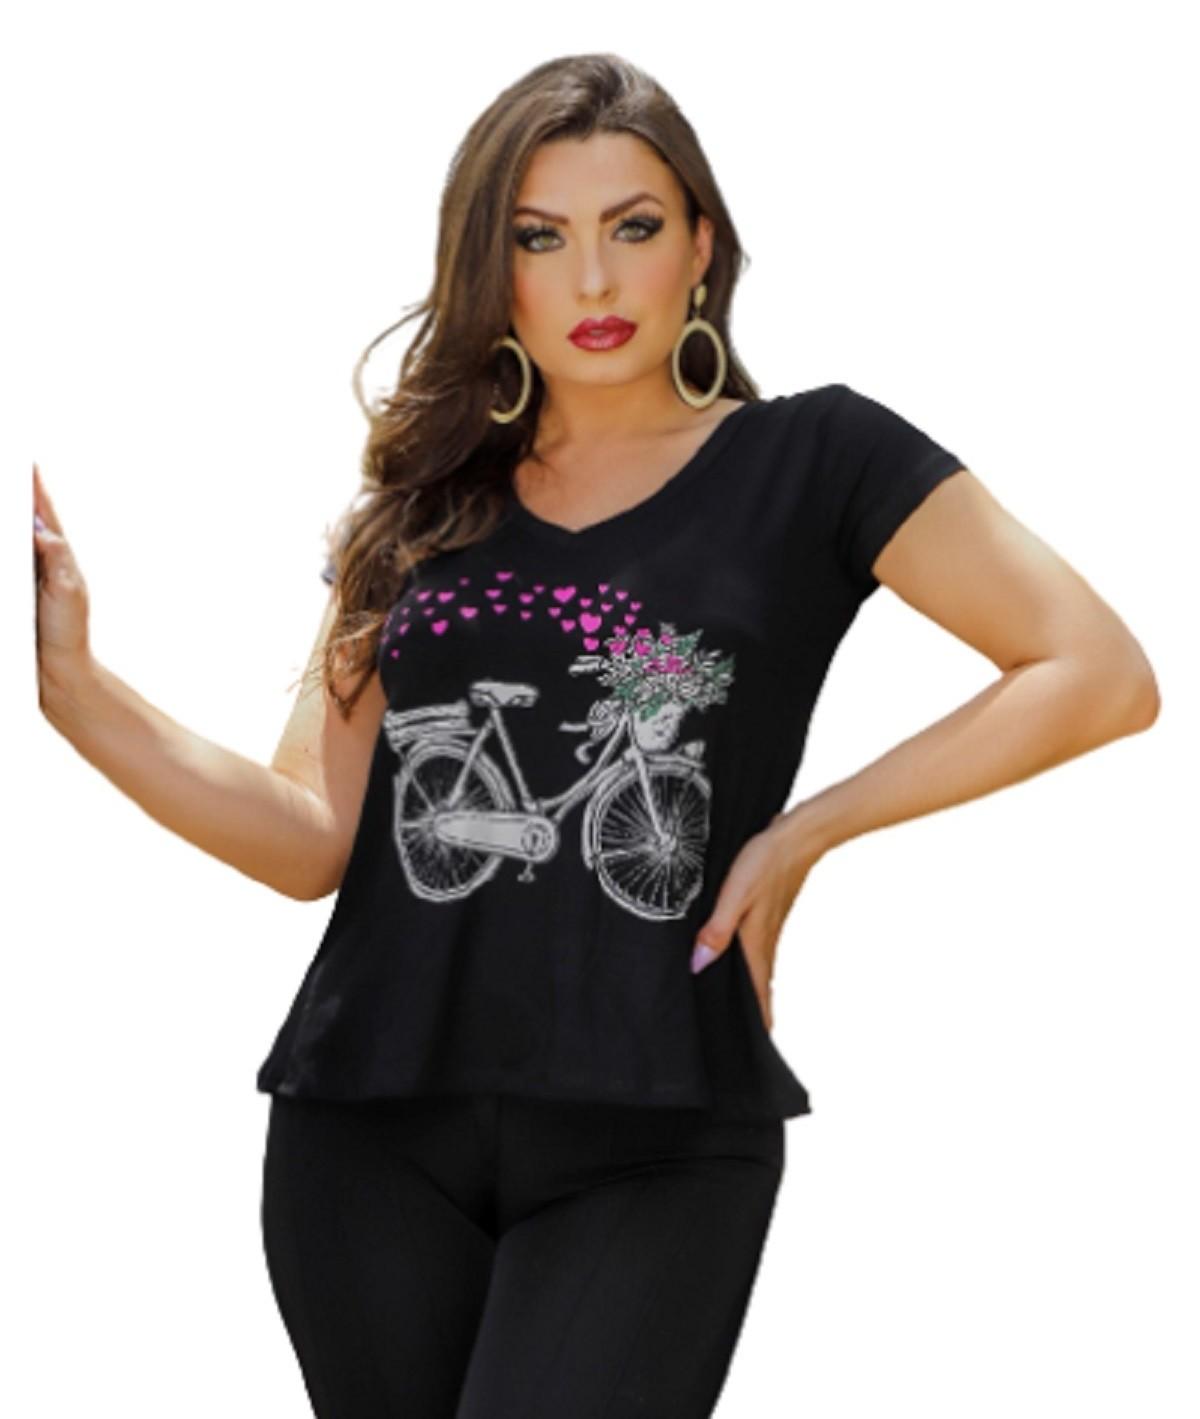 Blusa Feminina Manga Curta Bicicleta P ao GG  Mazal